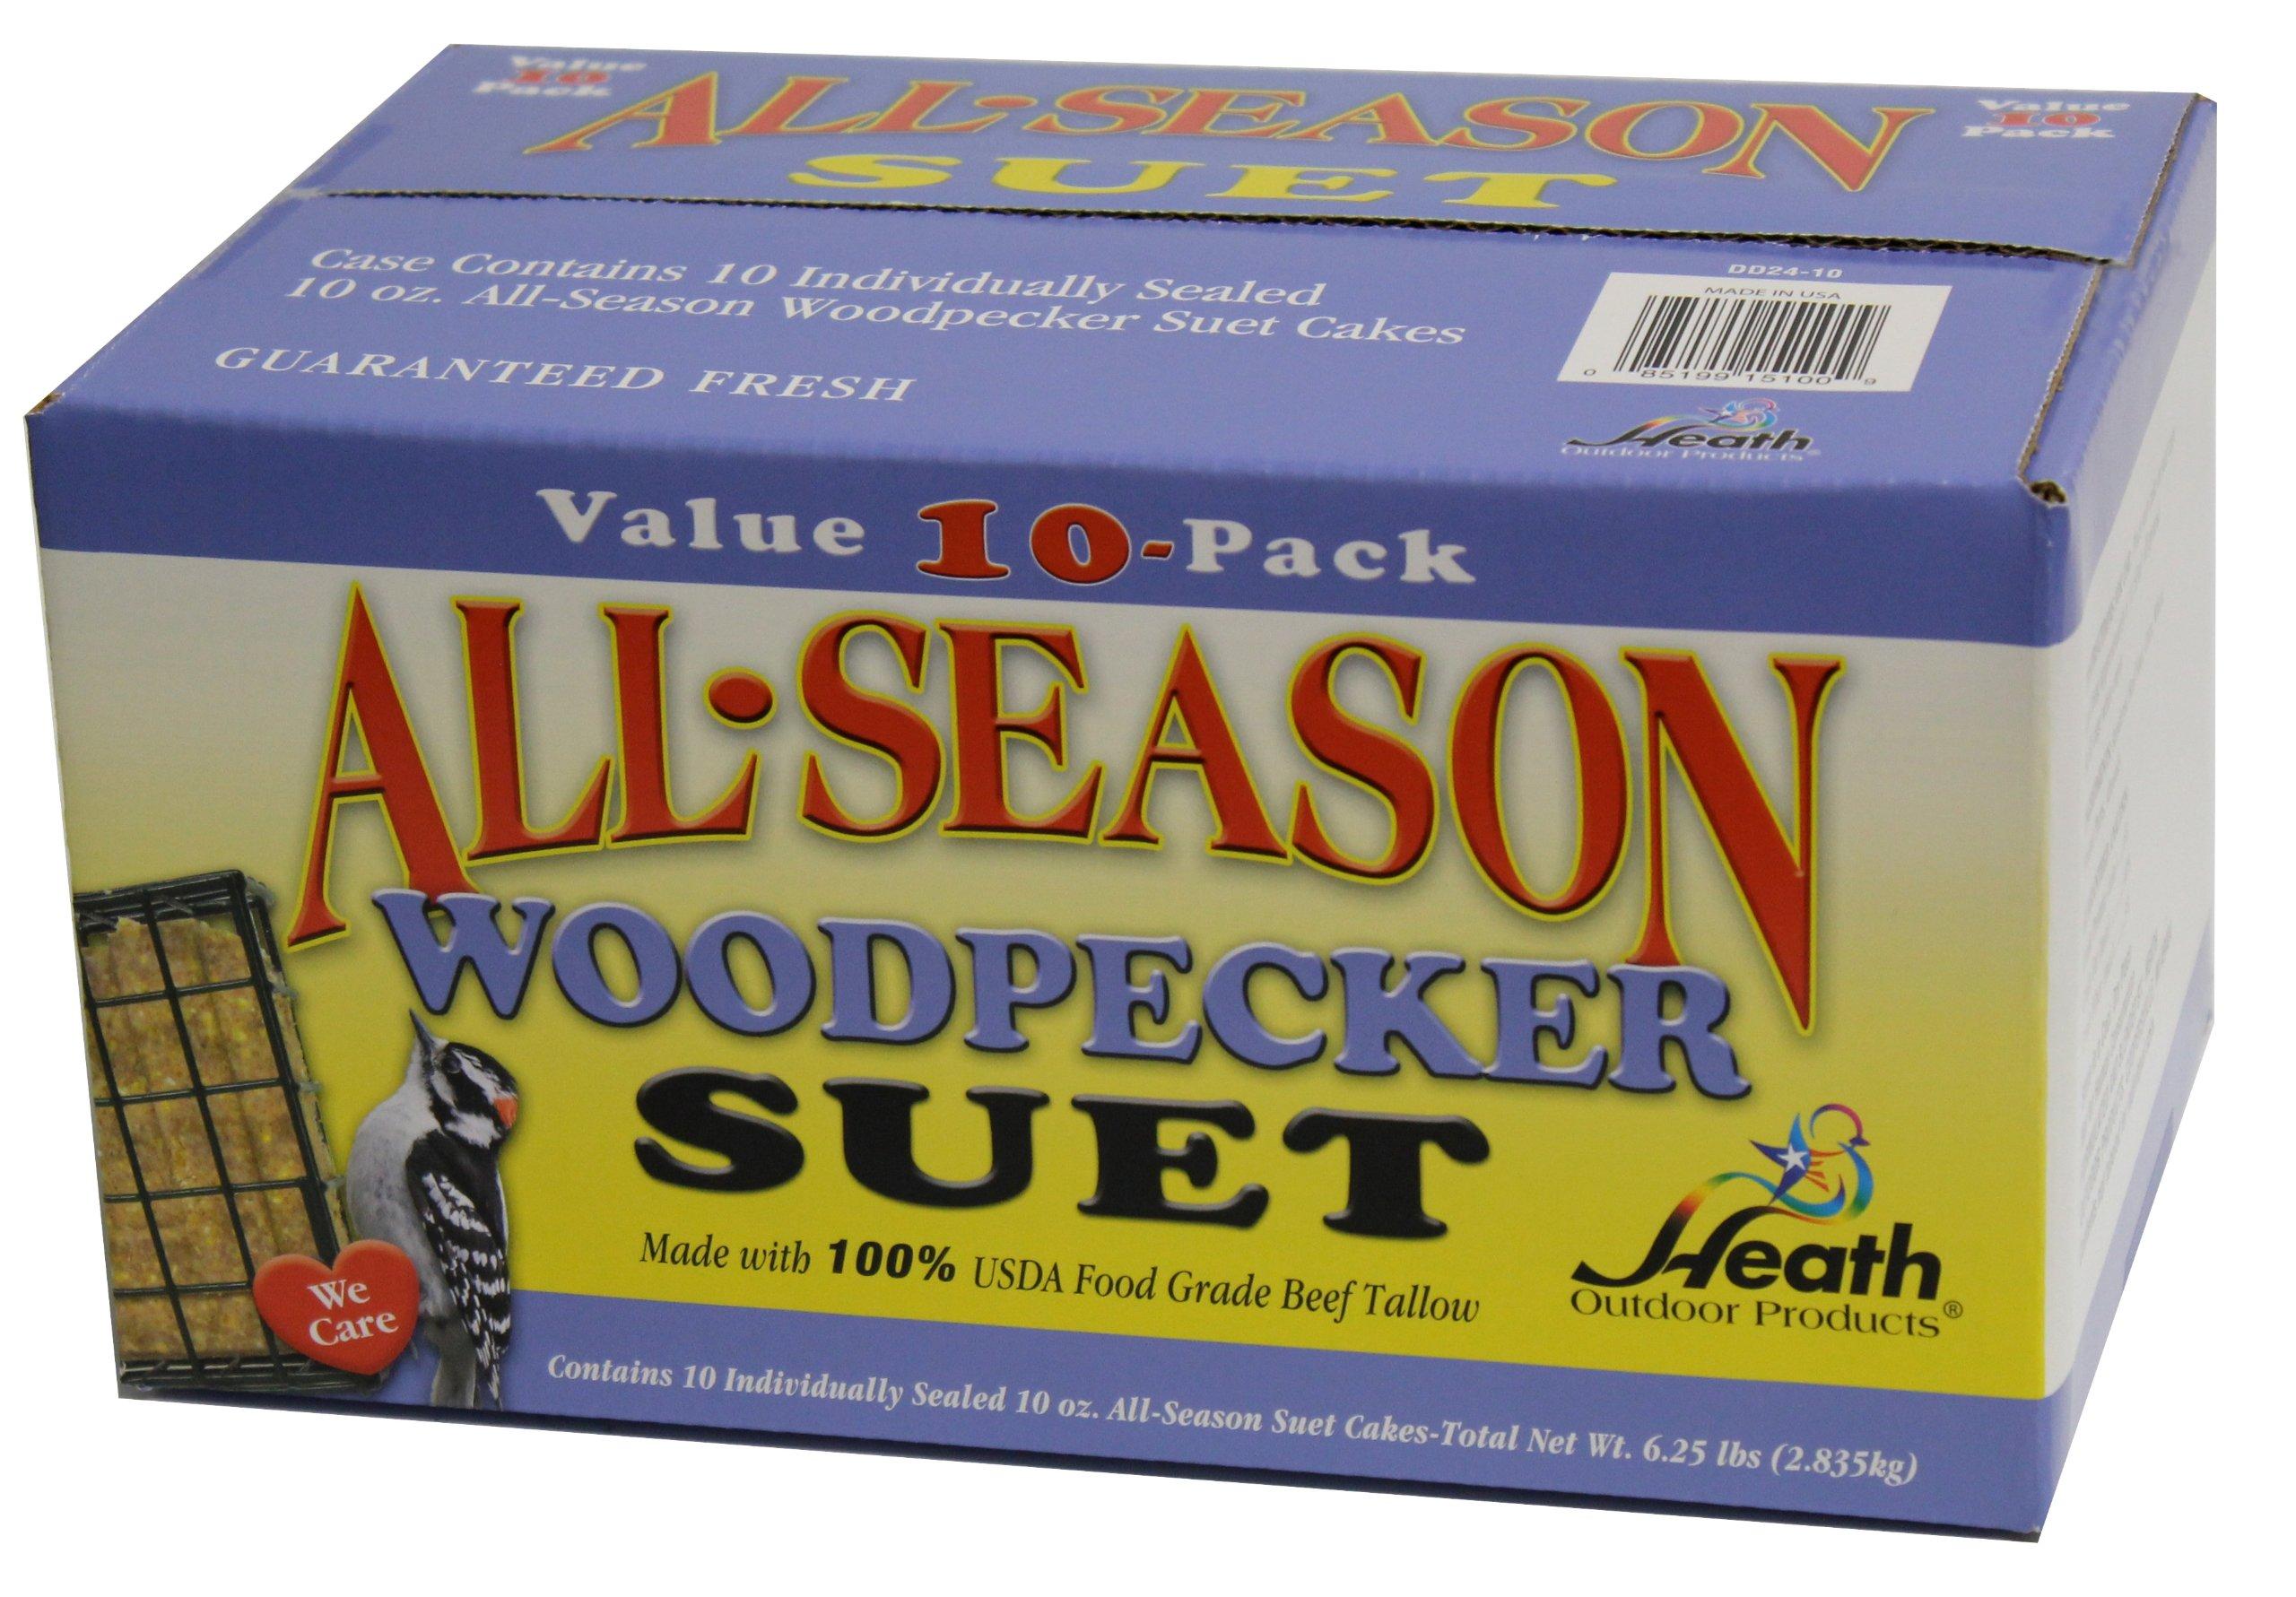 Heath Outdoor Products DD24-10 Woodpecker Suet Cake, 10 Pack